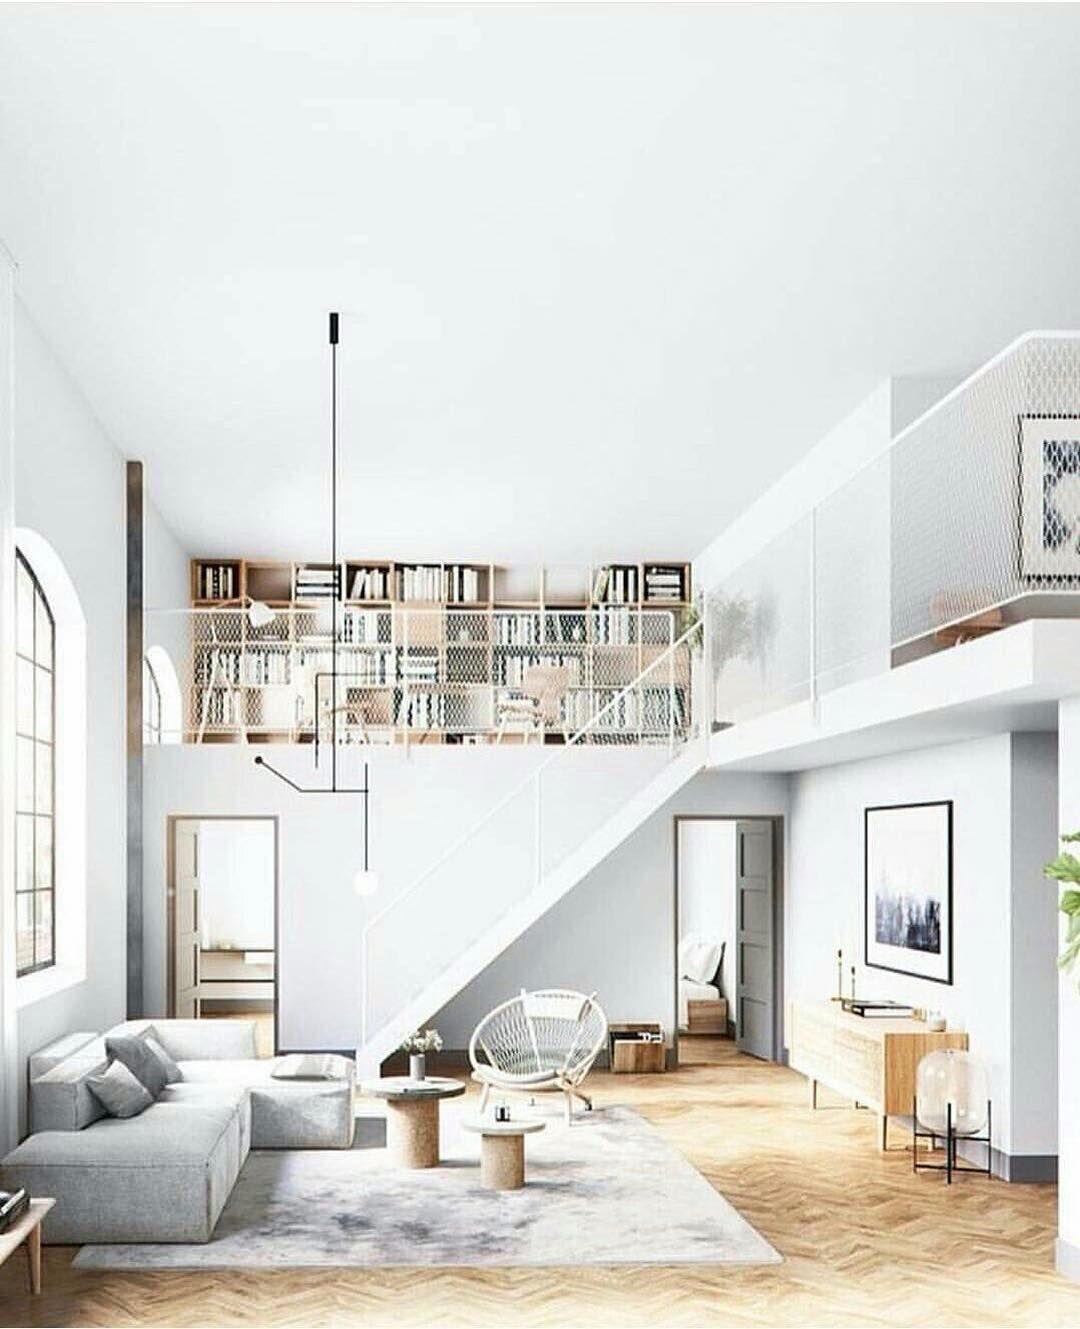 implied light light home interior design house design loft rh pinterest com